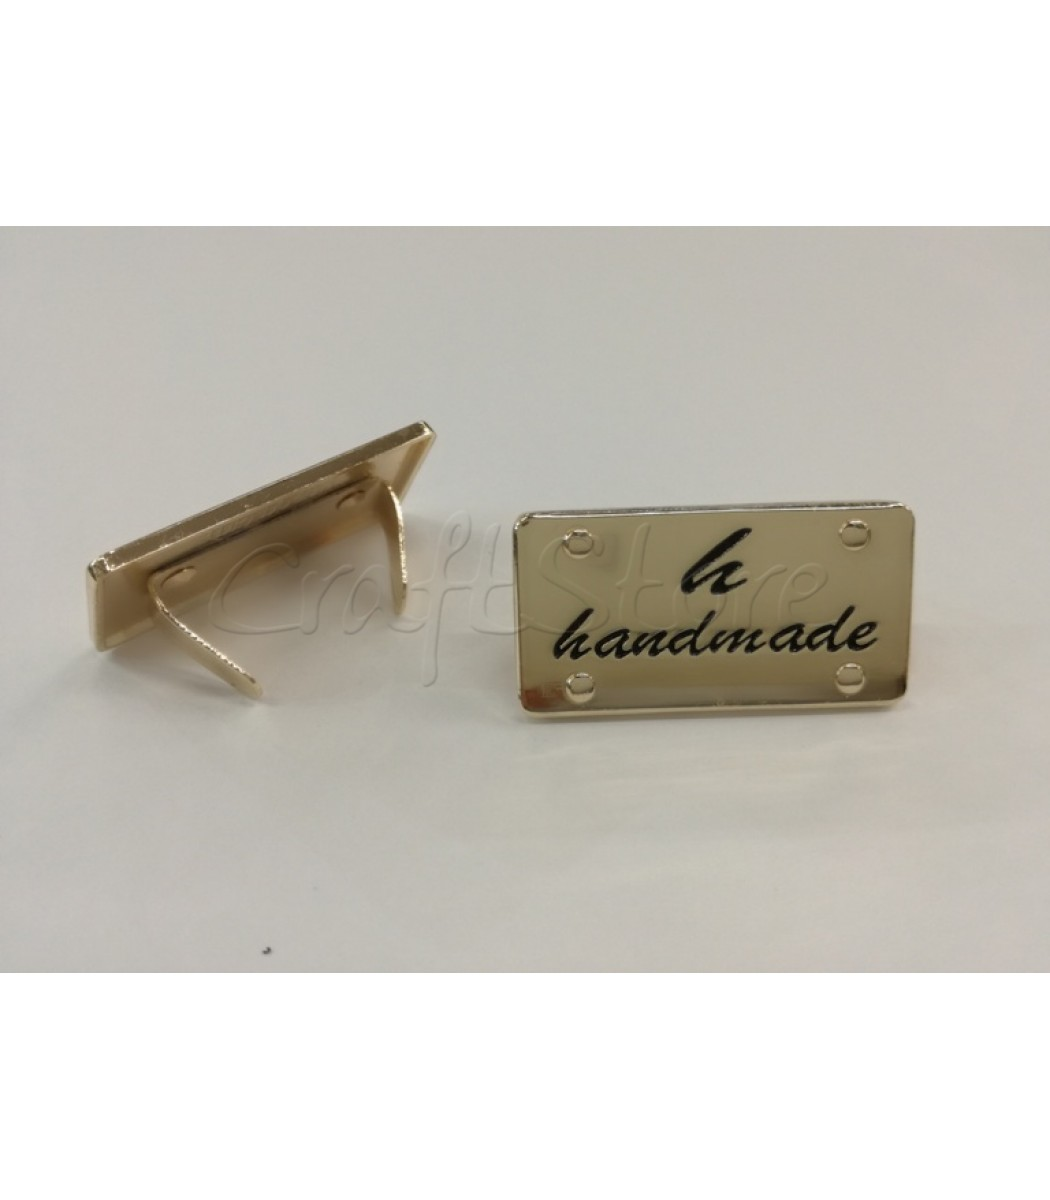 4577fe0334 Ταμπελάκι ομορφιάς Handmade 4x2cm Χρυσό